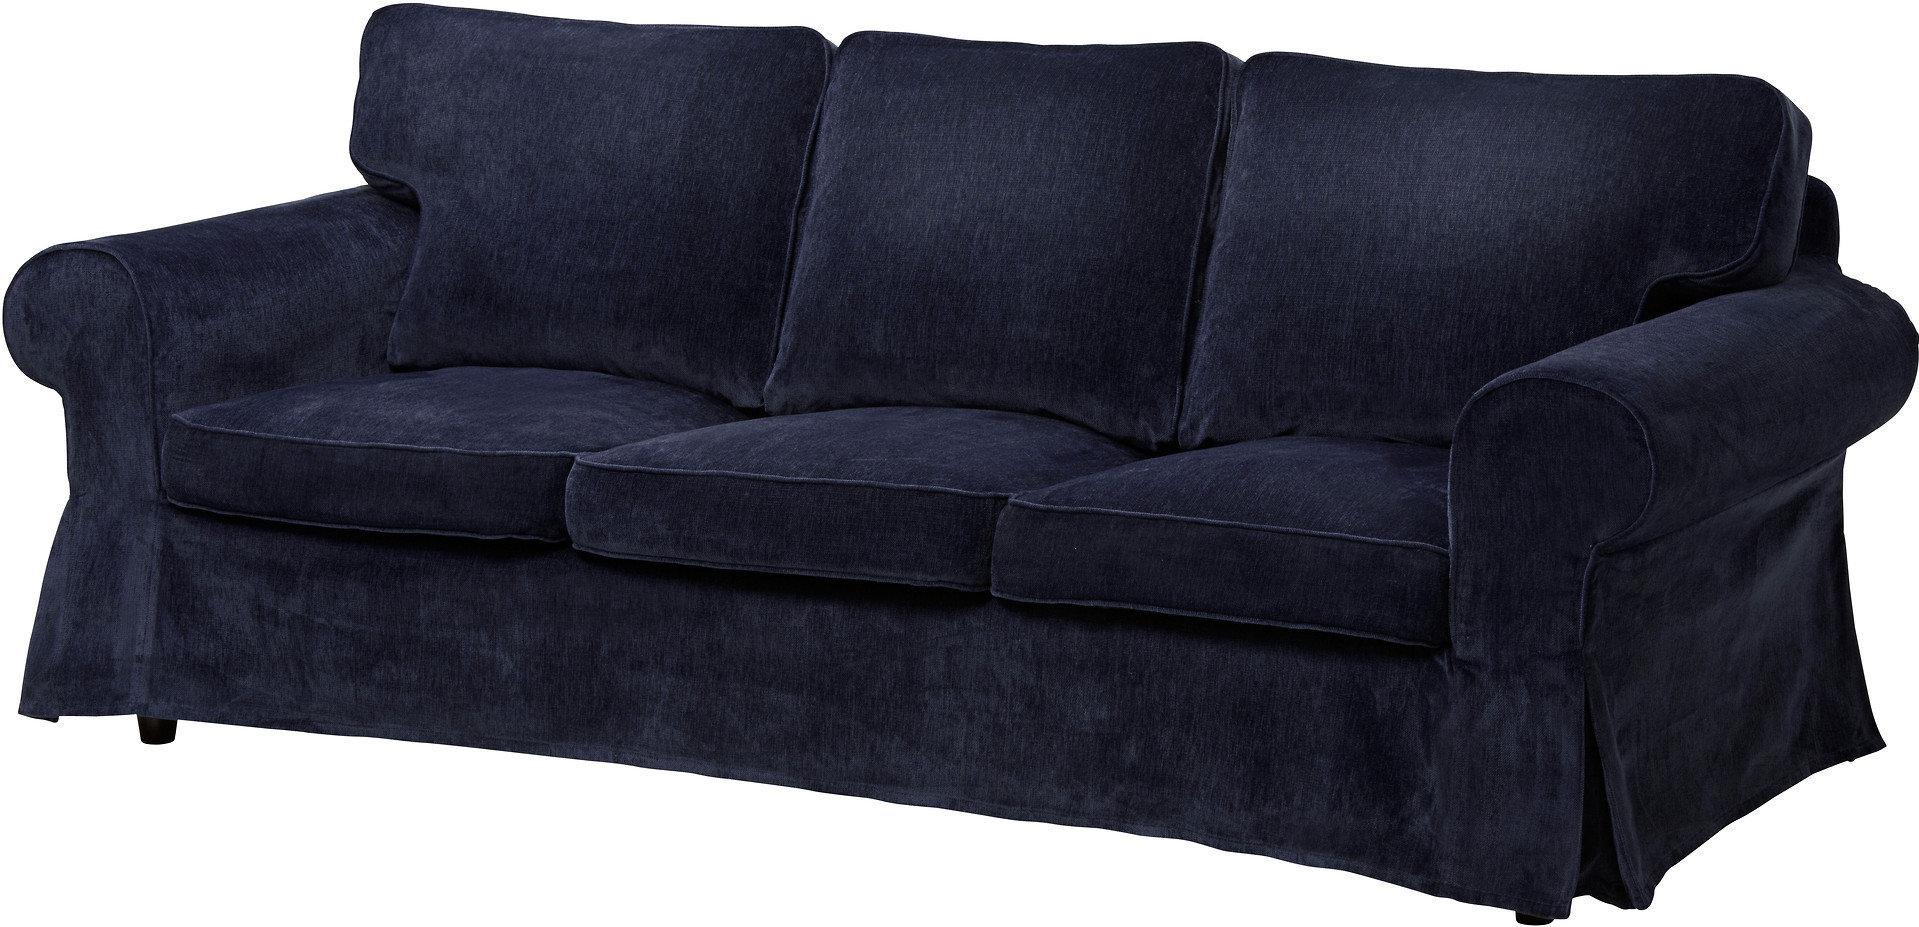 #Ikea                     #sofa                     #EKTORP #Sofa #Vellinge #dark #blue #IKEA           EKTORP Sofa - Vellinge dark blue - IKEA                                       http://www.seapai.com/product.aspx?PID=1888840